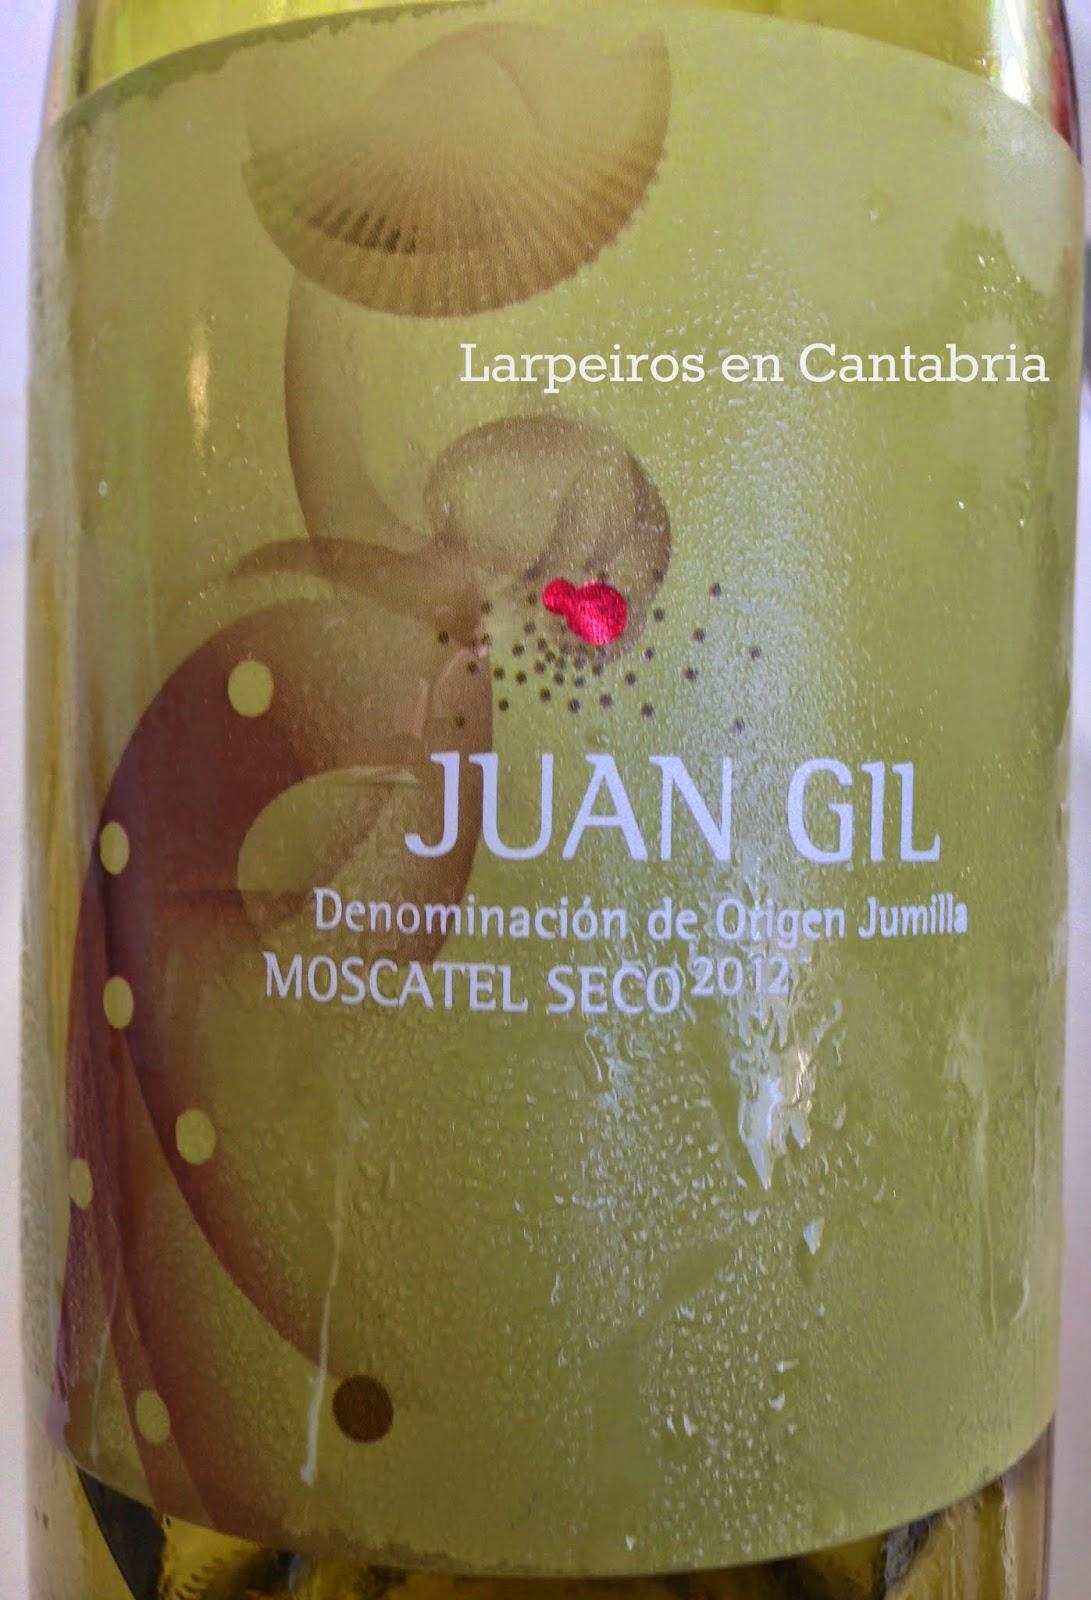 Vino Blanco Juan Gil Moscatel Seco 2012: Nos gusta esta bodega